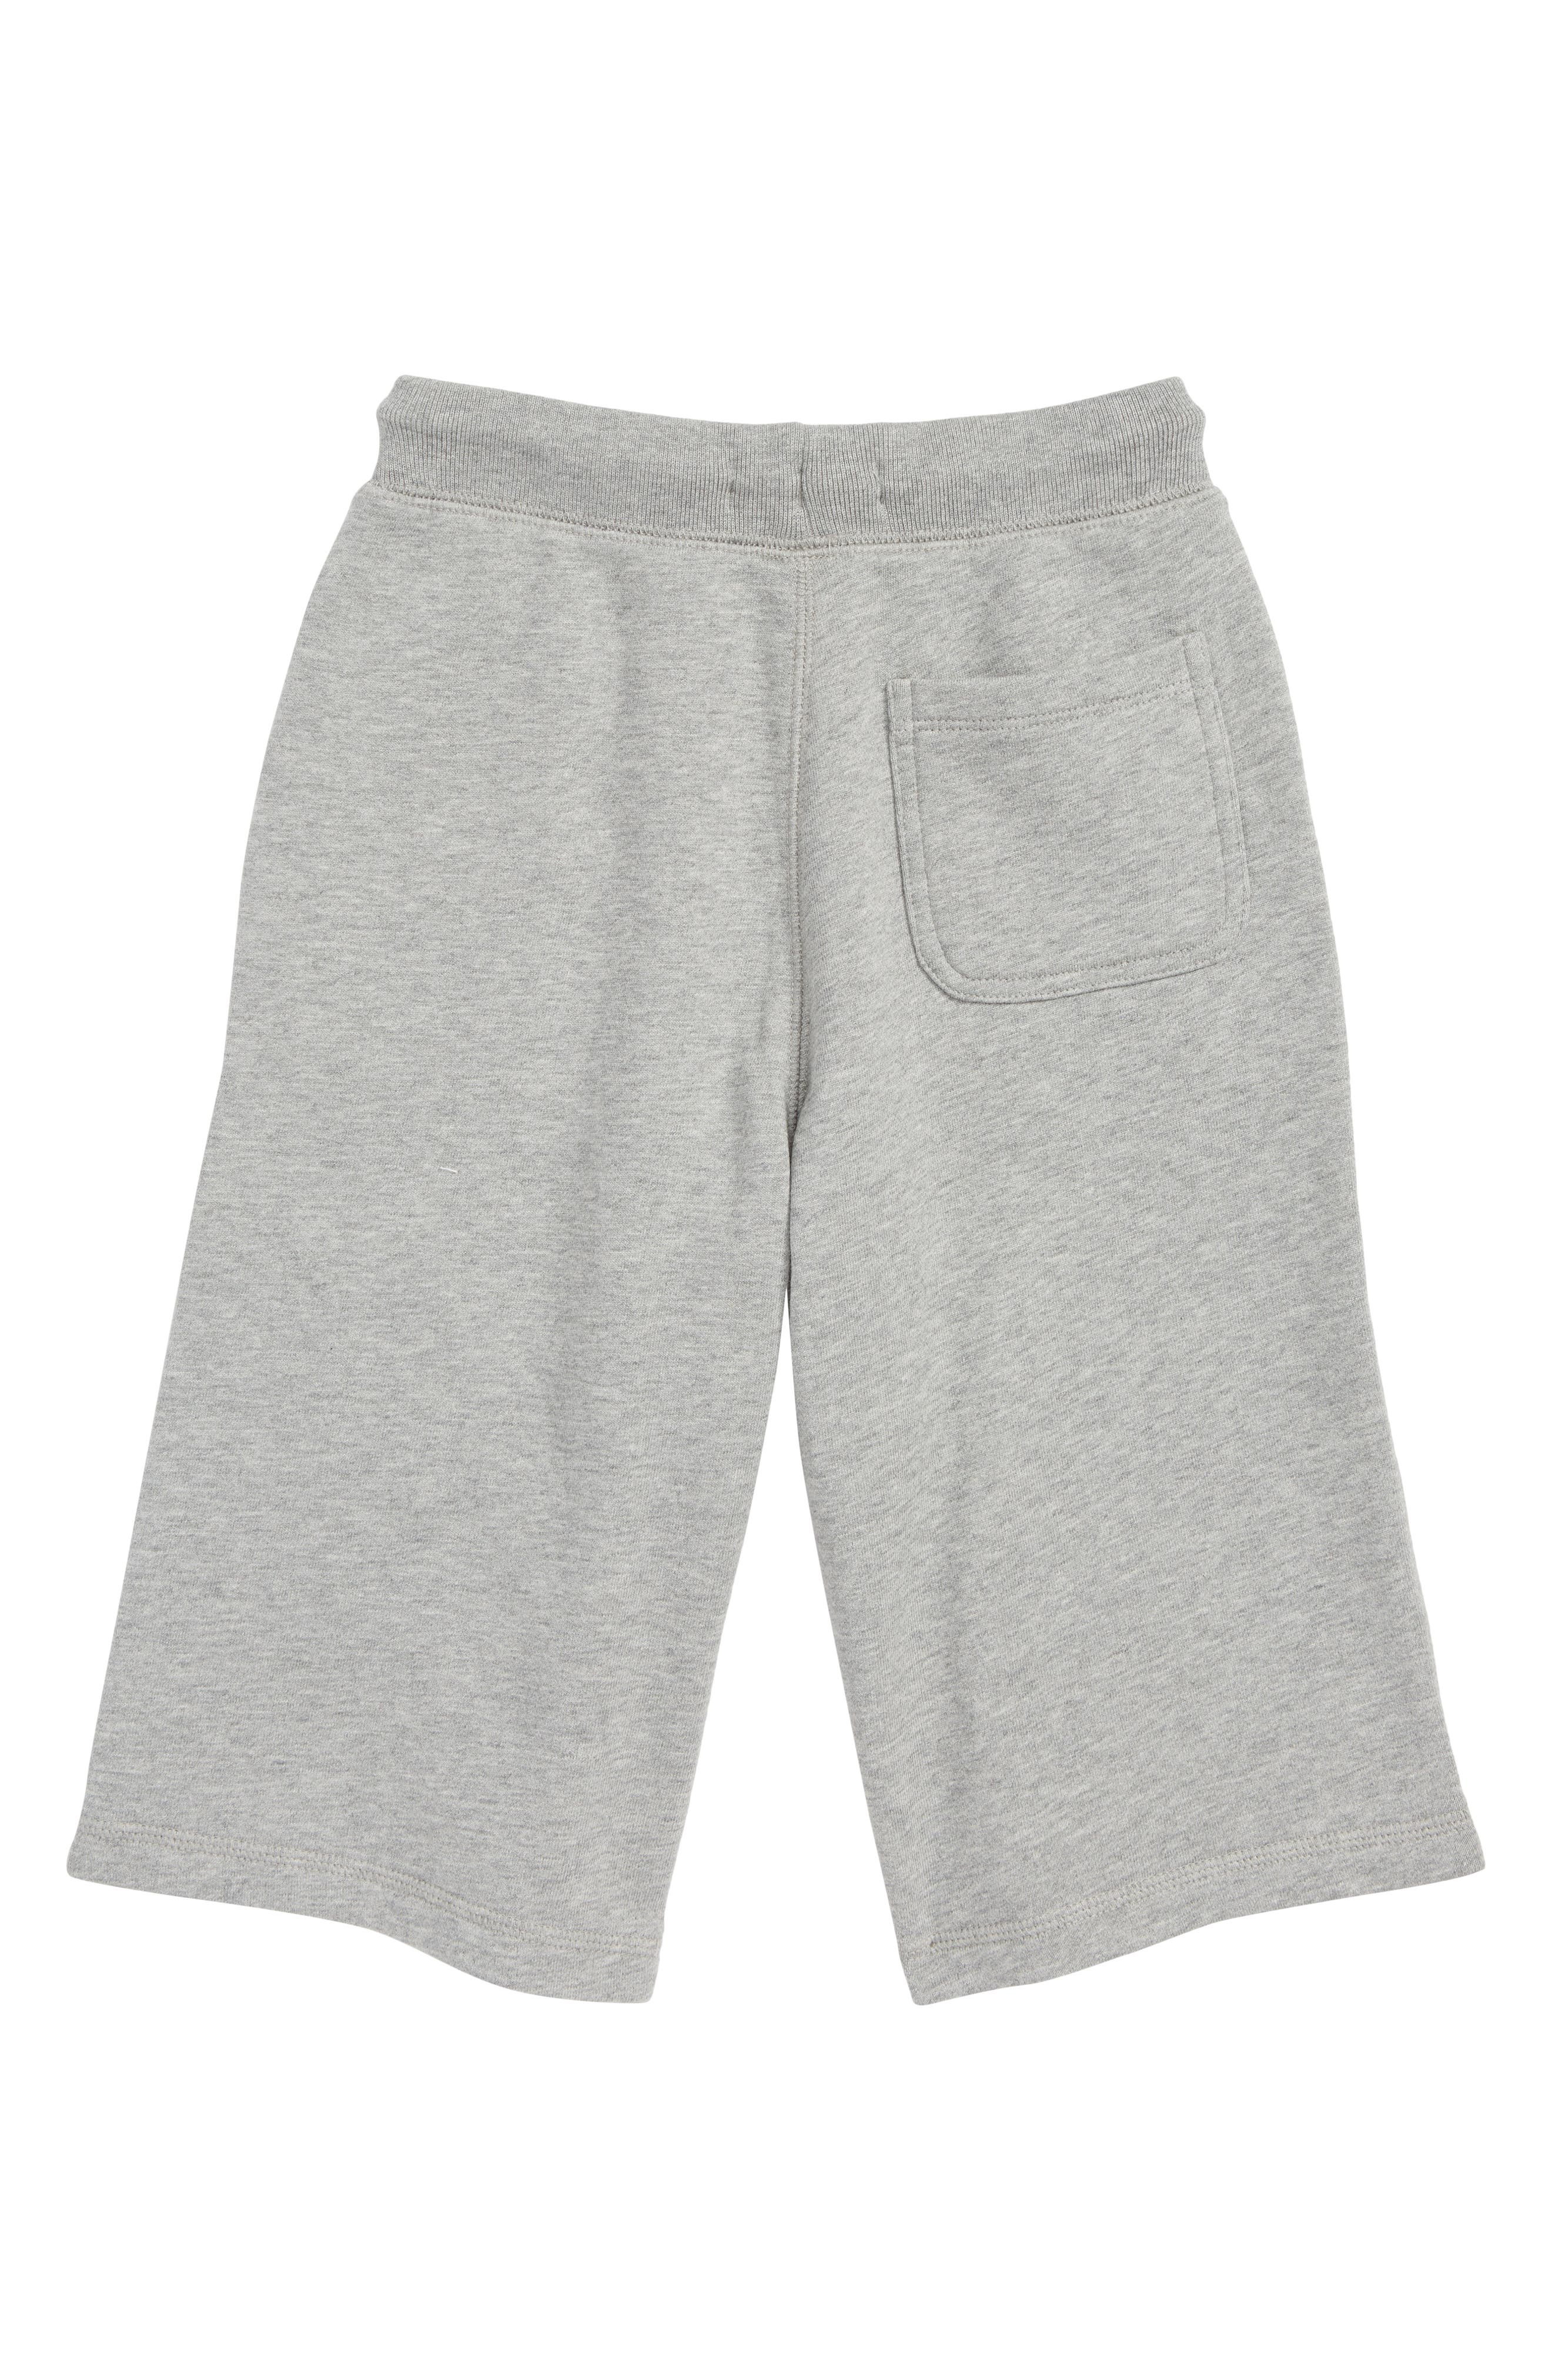 Knit Shorts,                             Alternate thumbnail 2, color,                             GREY MELANGE